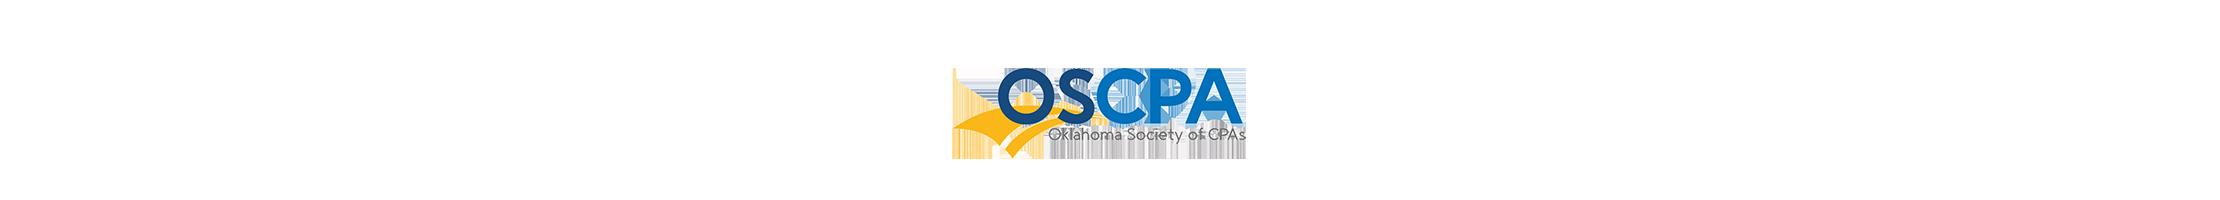 OSCPA-logo.png